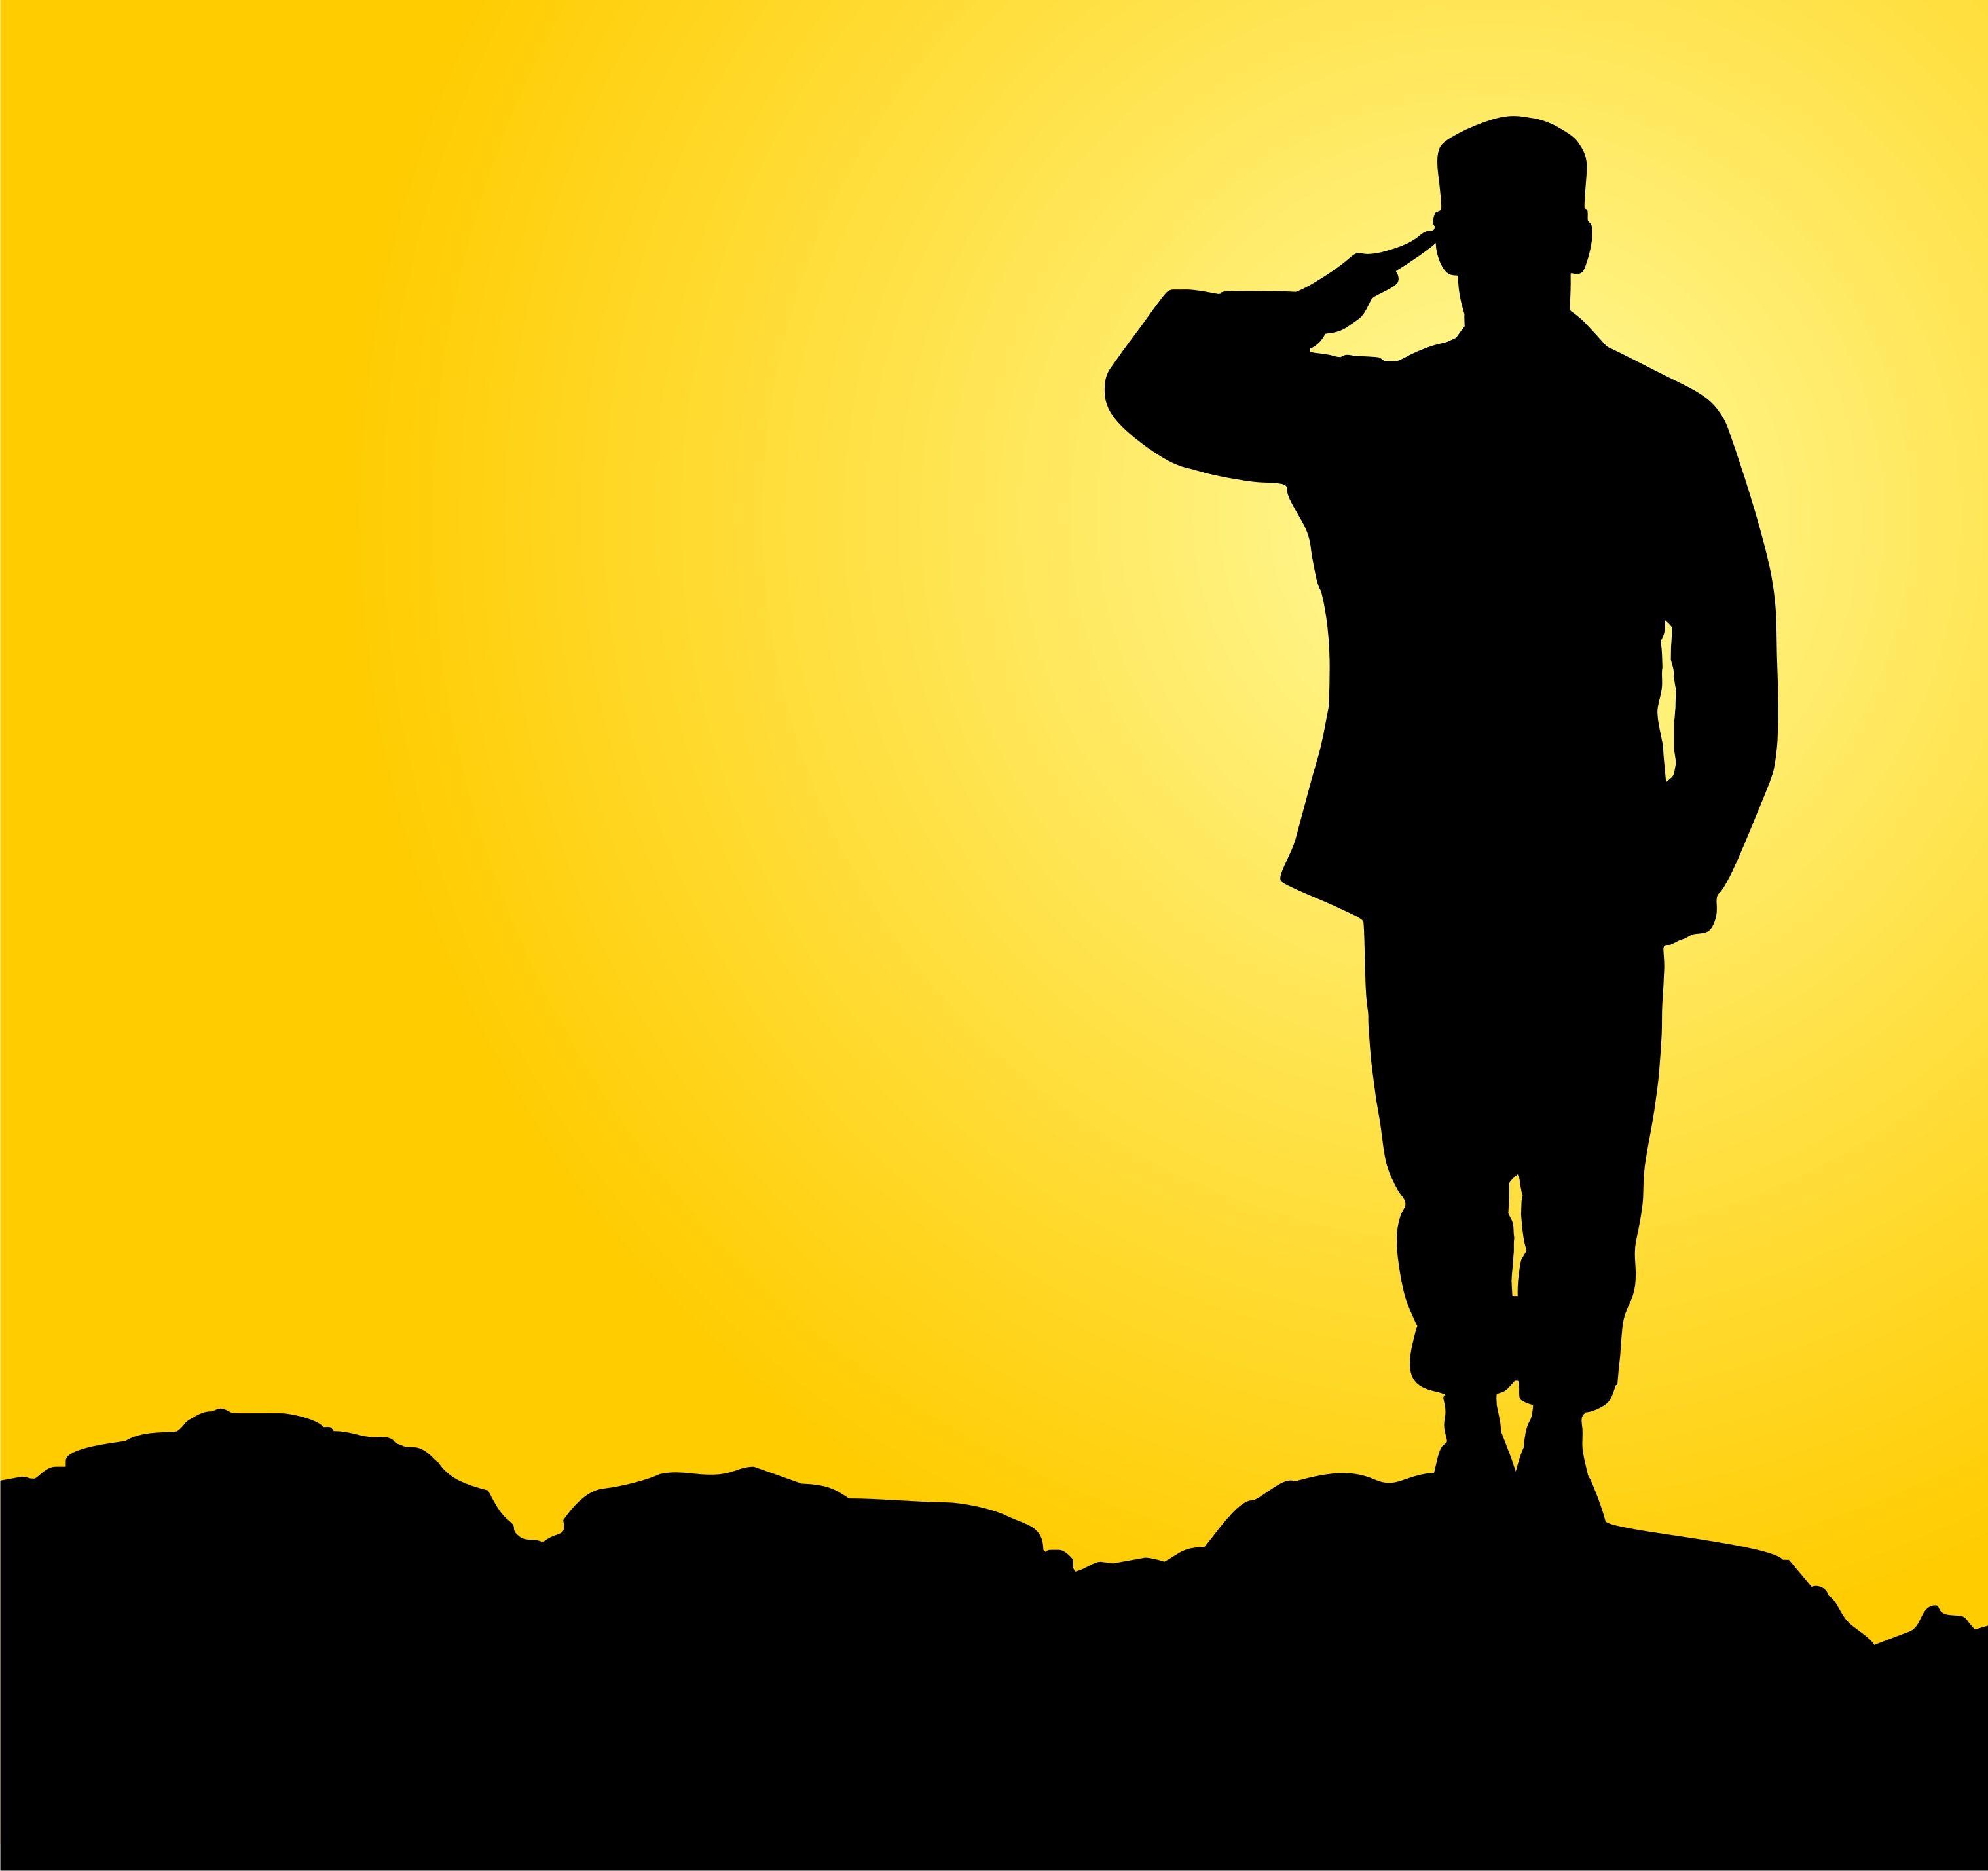 military ultimate sacrifice clip art - HD3036×2857